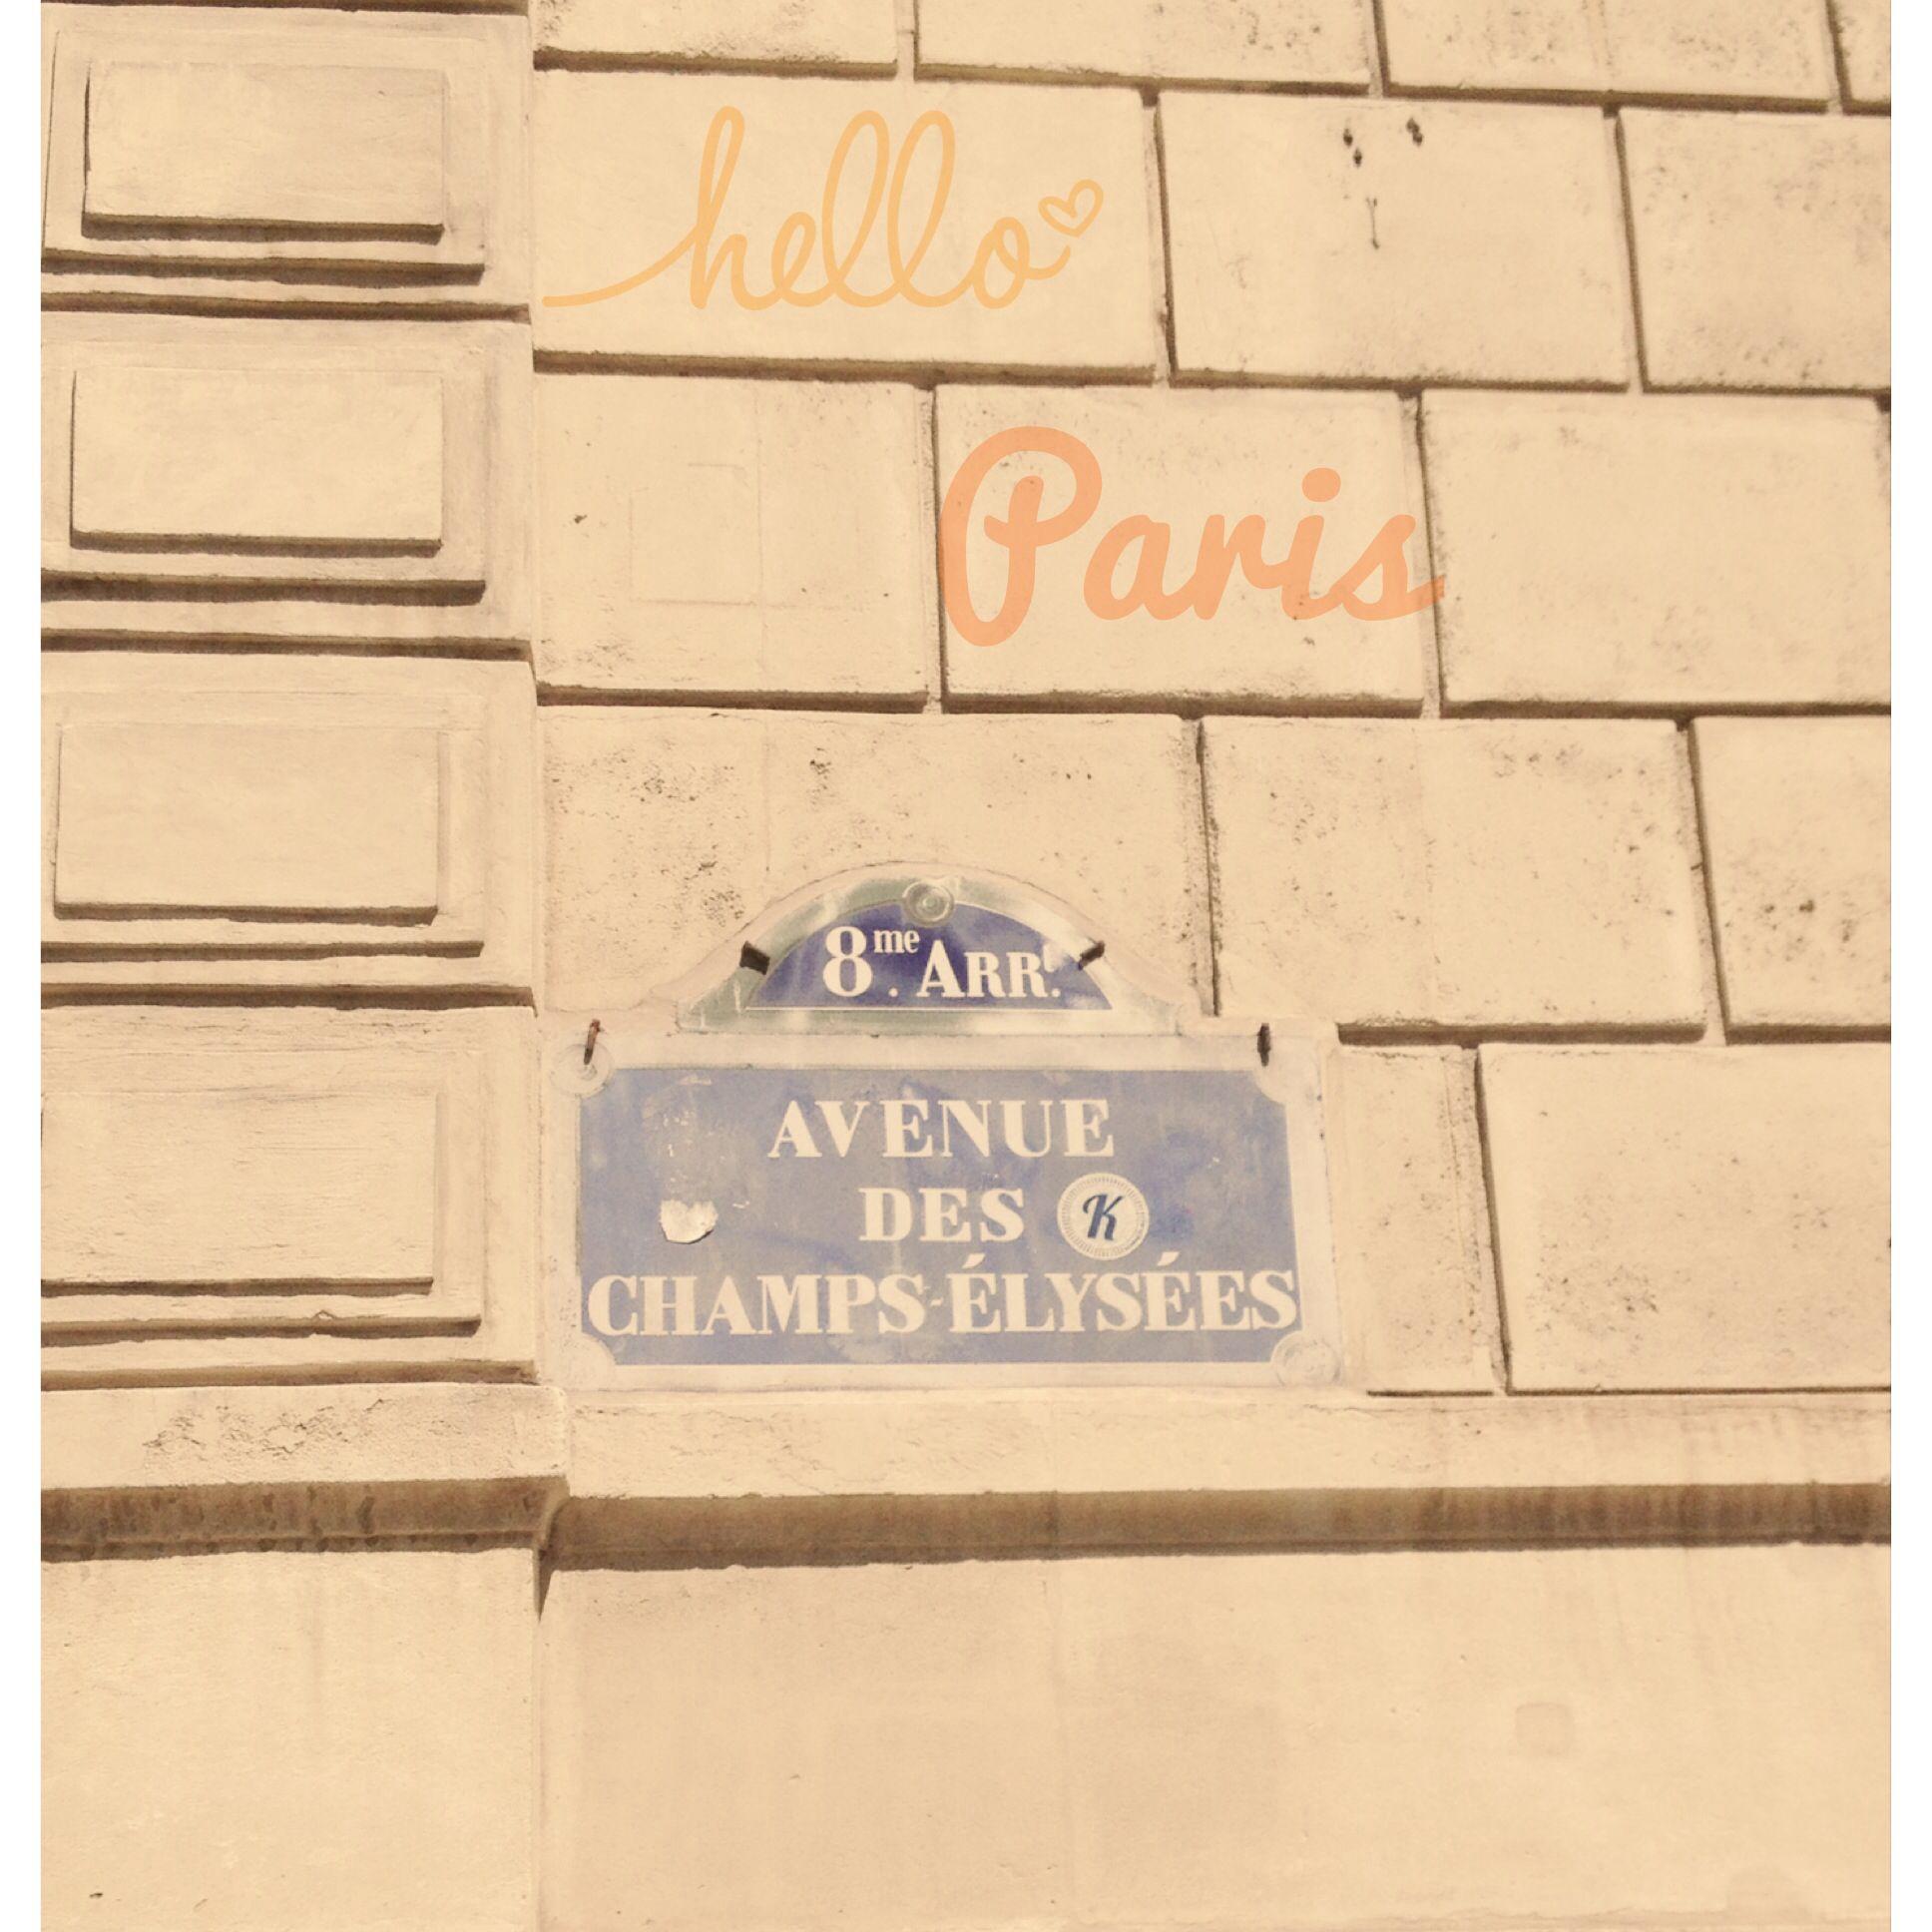 Champs élysées.